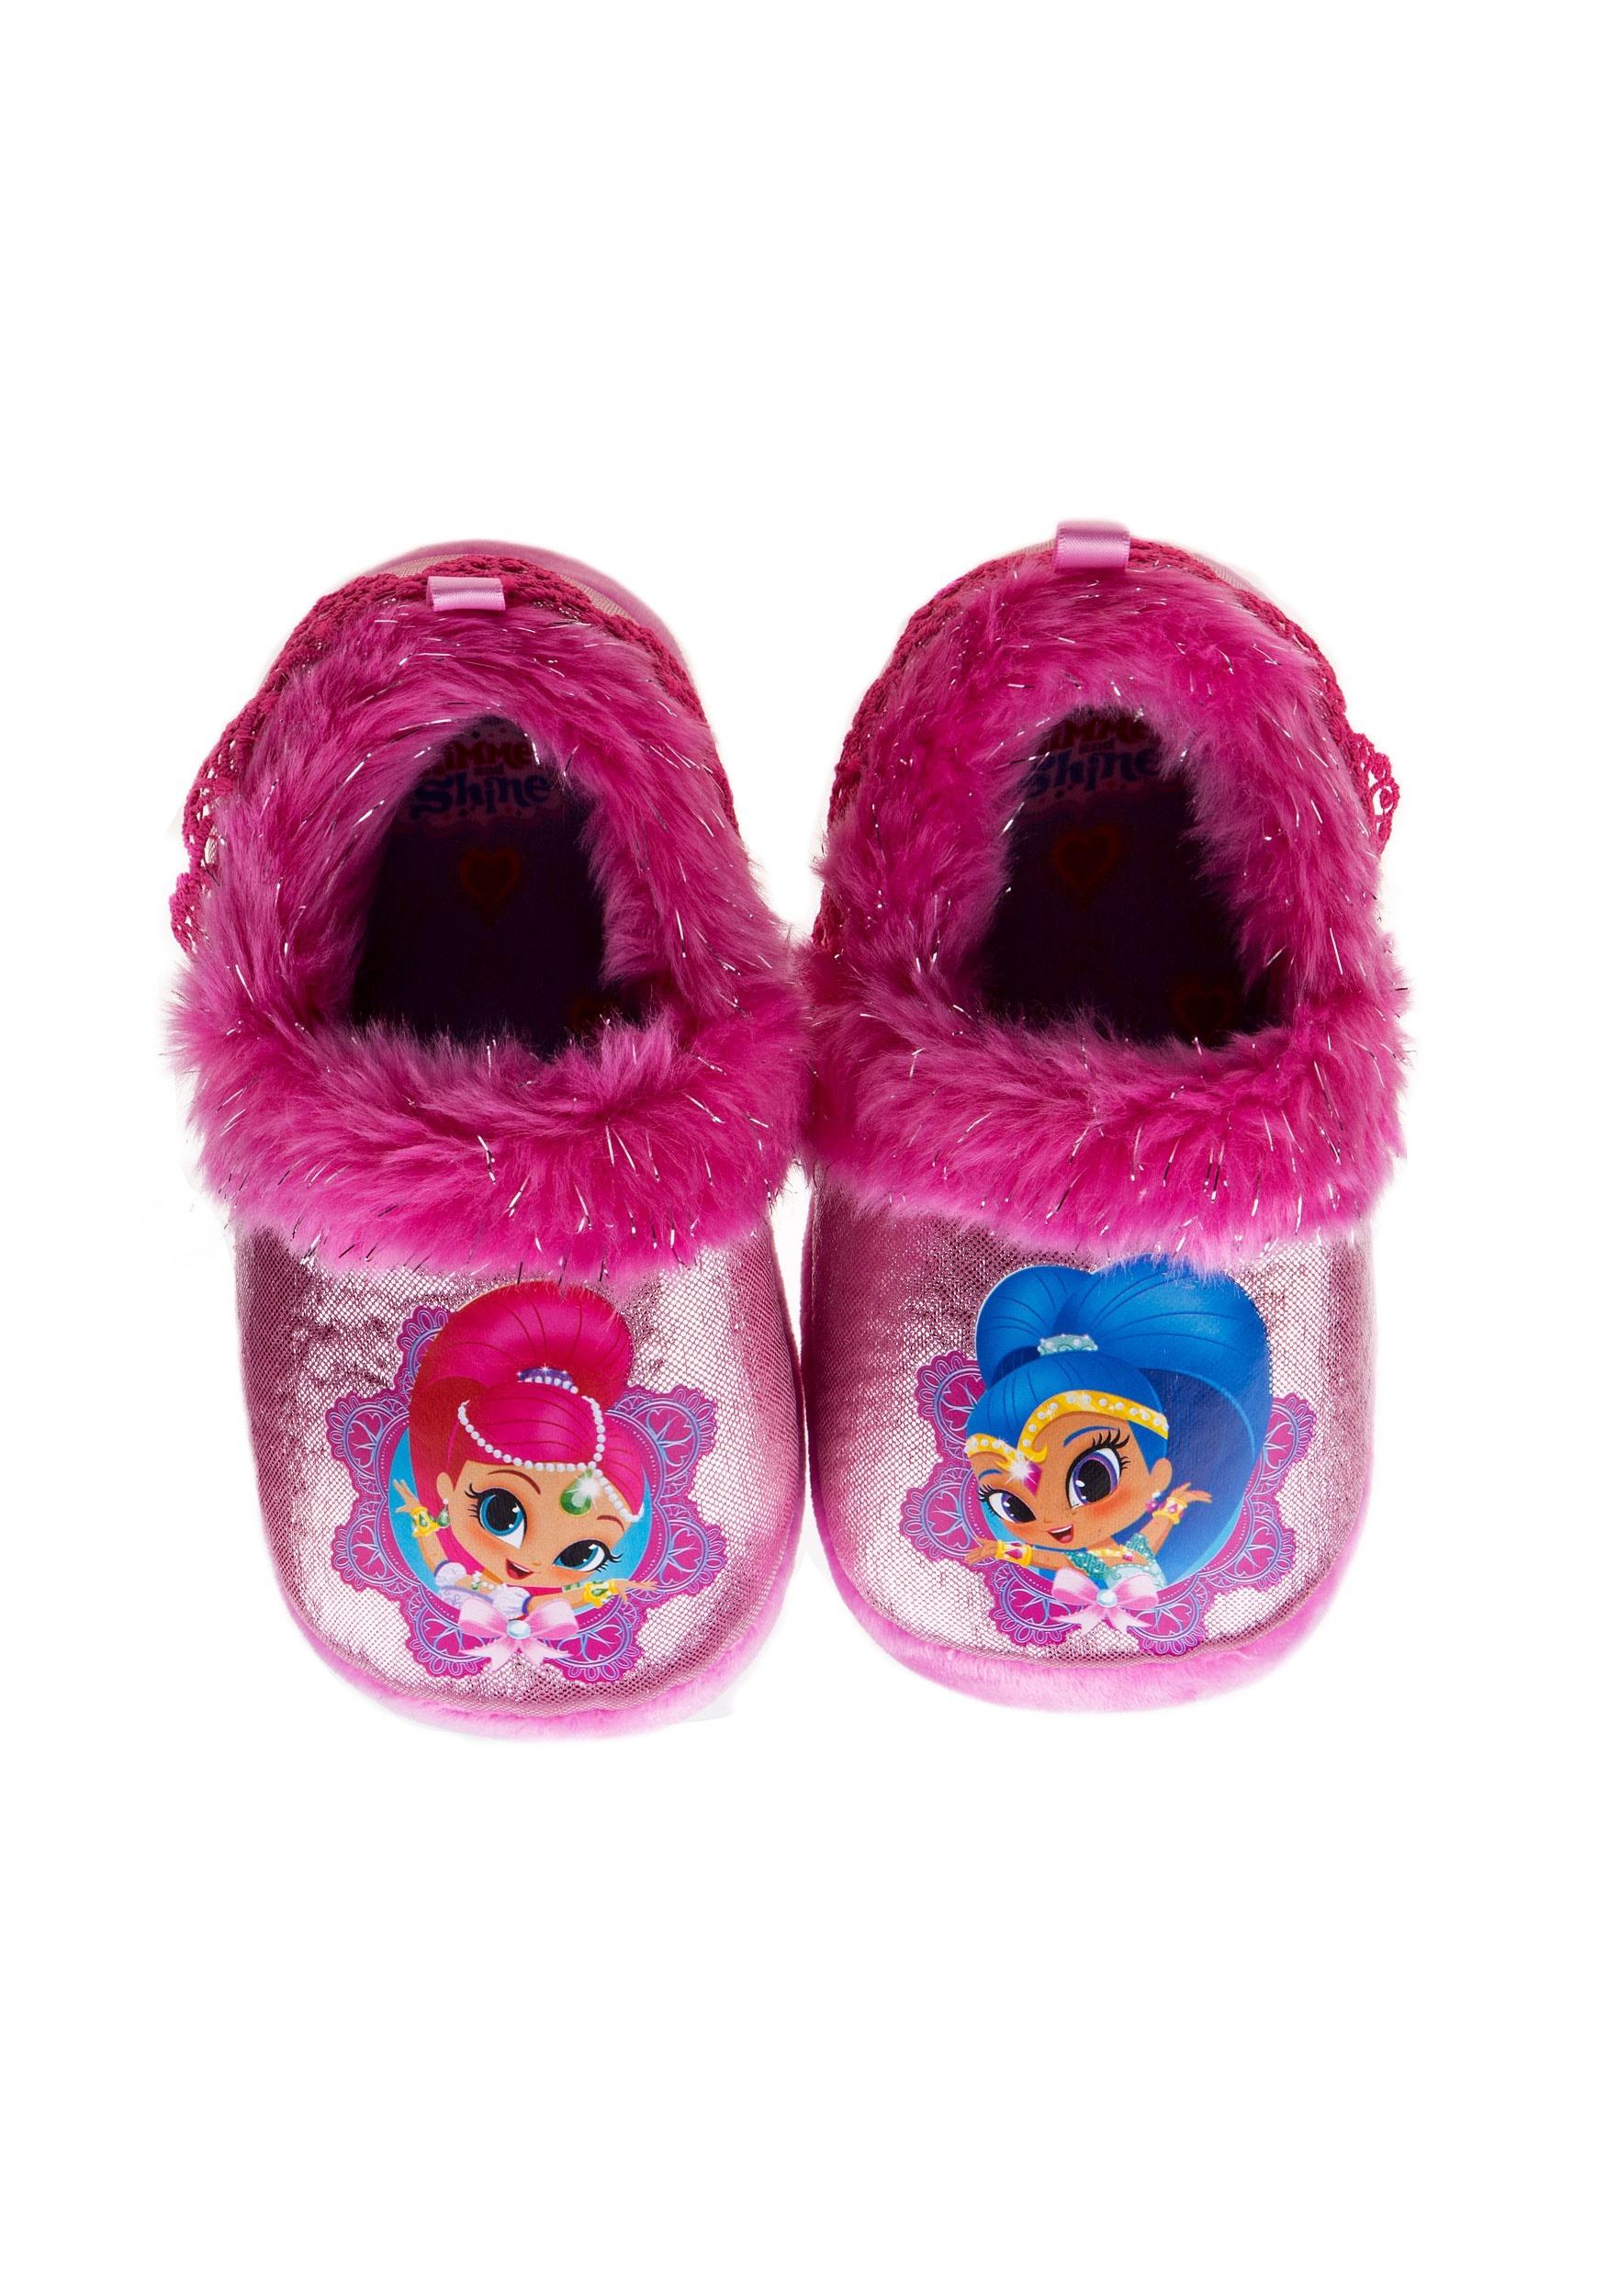 5b4d4056dfde Nickelodeon Shimmer   Shine Child Slippers